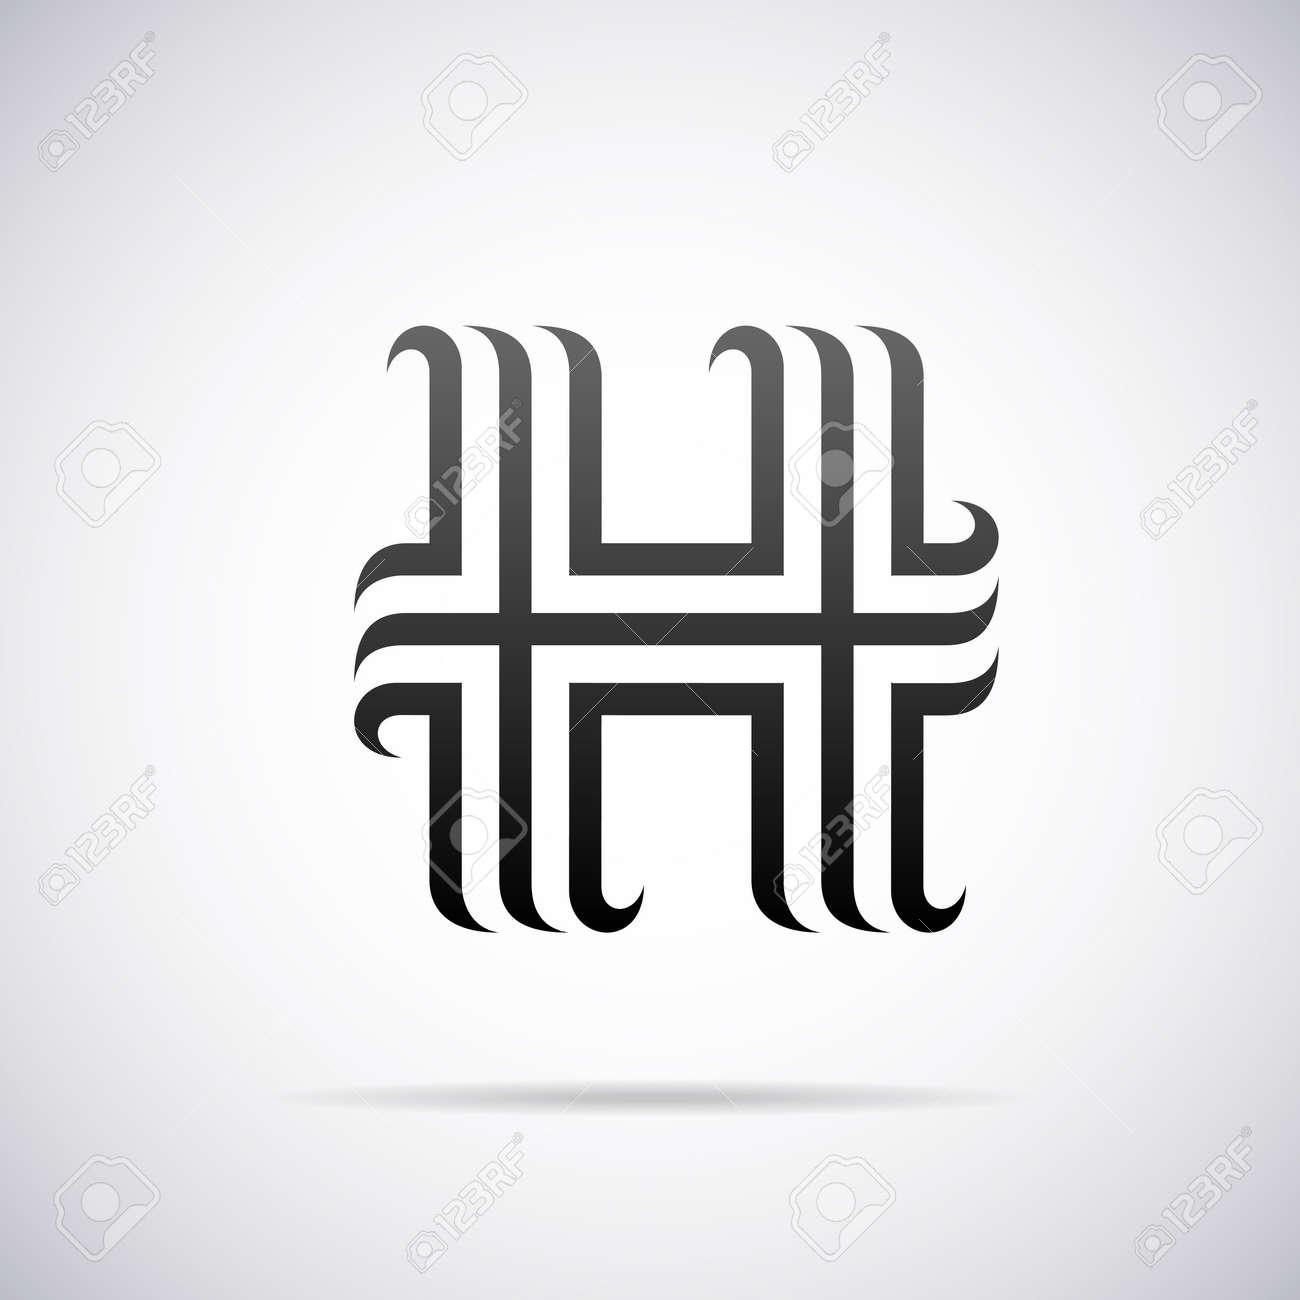 Letter h design template vector illustration royalty free cliparts letter h design template vector illustration stock vector 40296100 pronofoot35fo Gallery